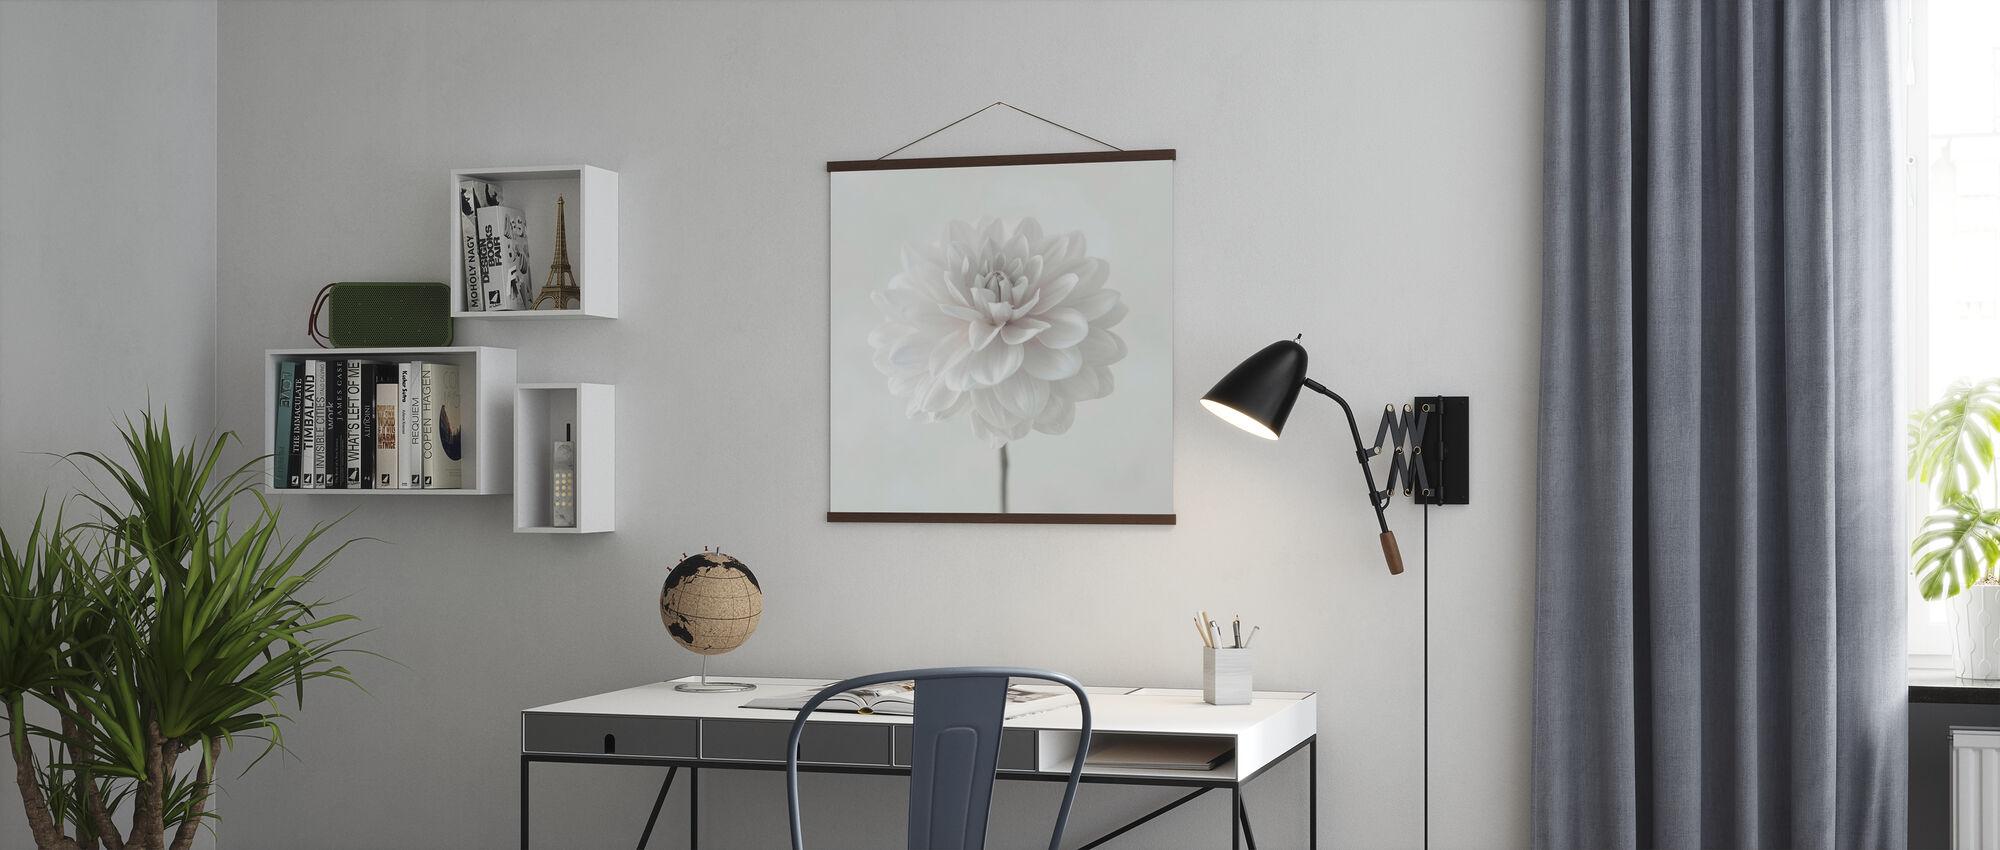 Dahlias - Poster - Office